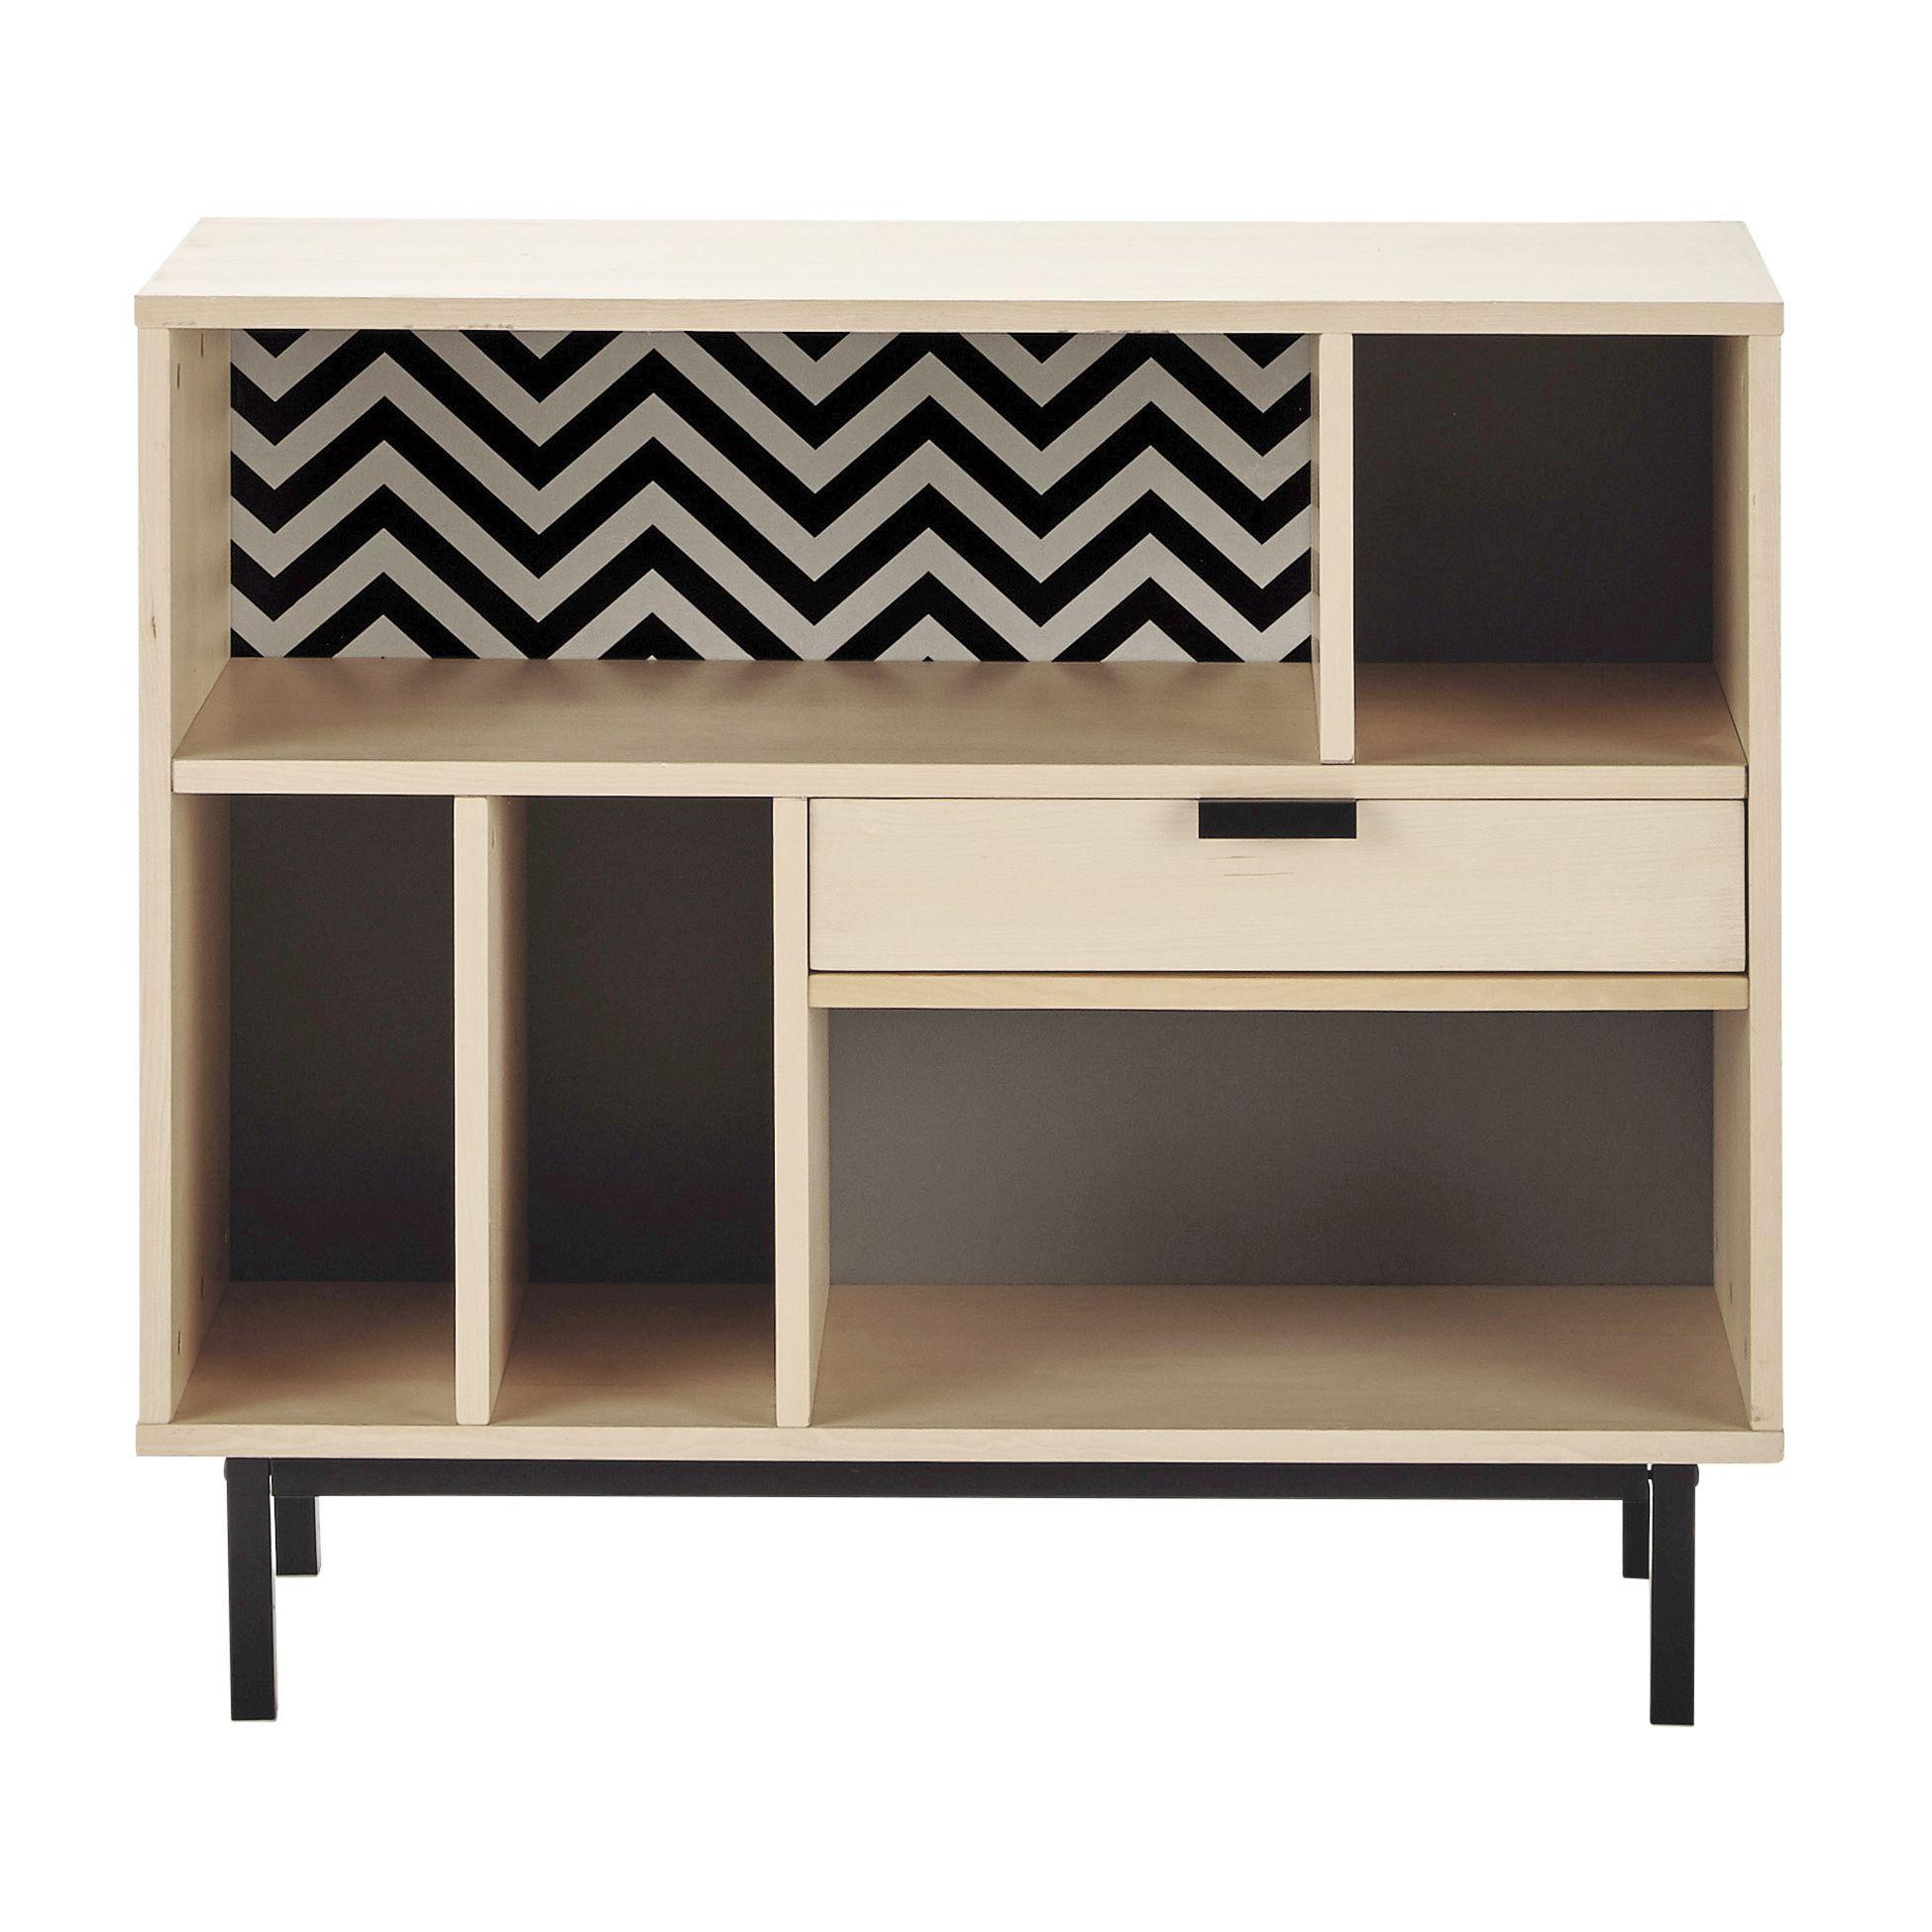 Wooden Highboard W 92cm Graphik Furniture Furniture Sale Wardrobe Furniture